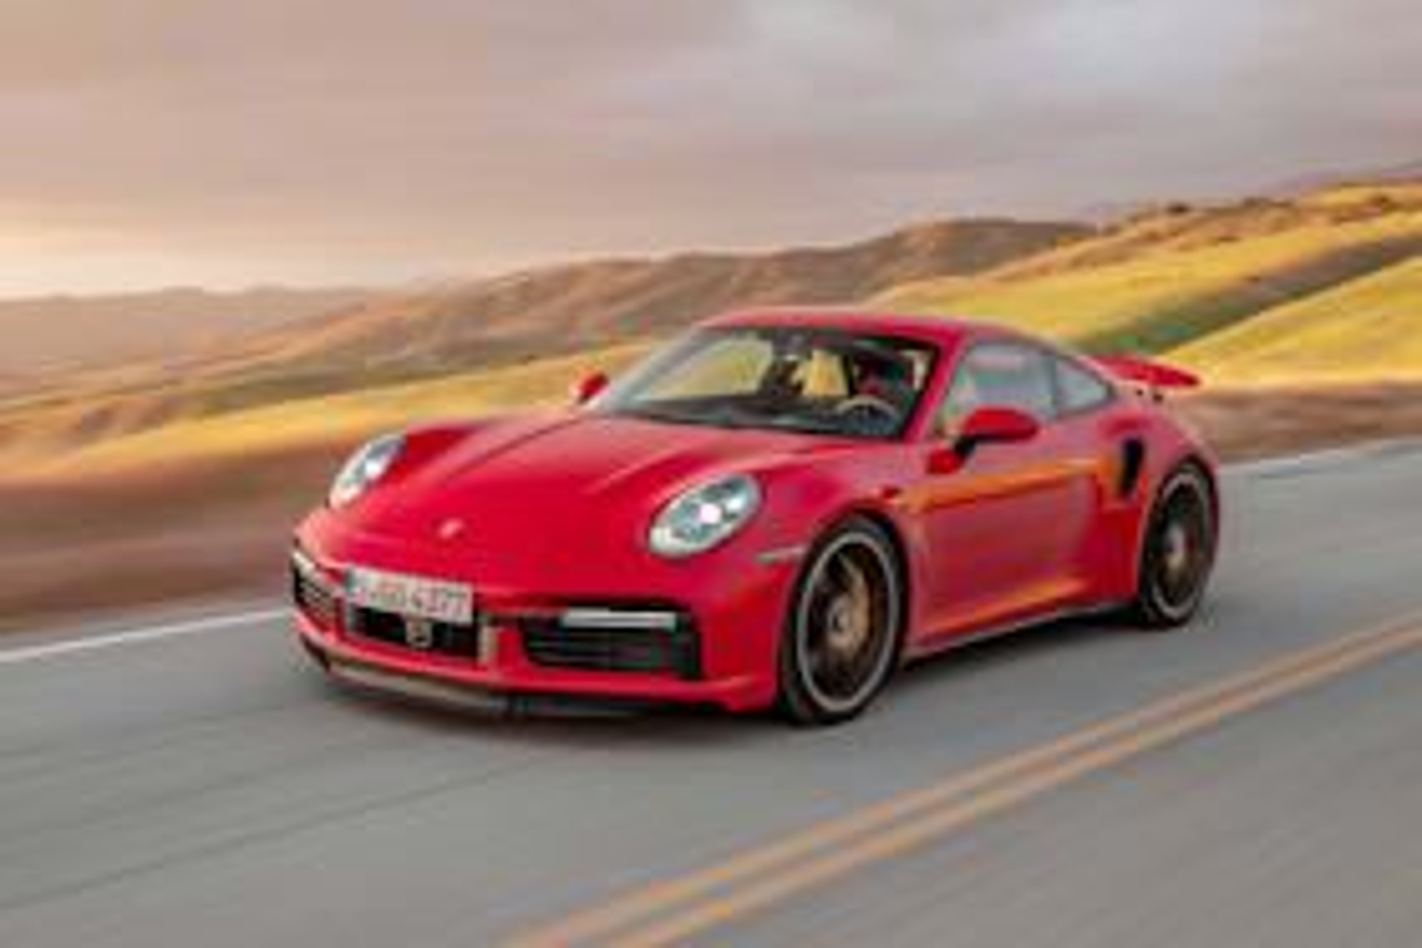 Porsche 992 911 Turbo S review